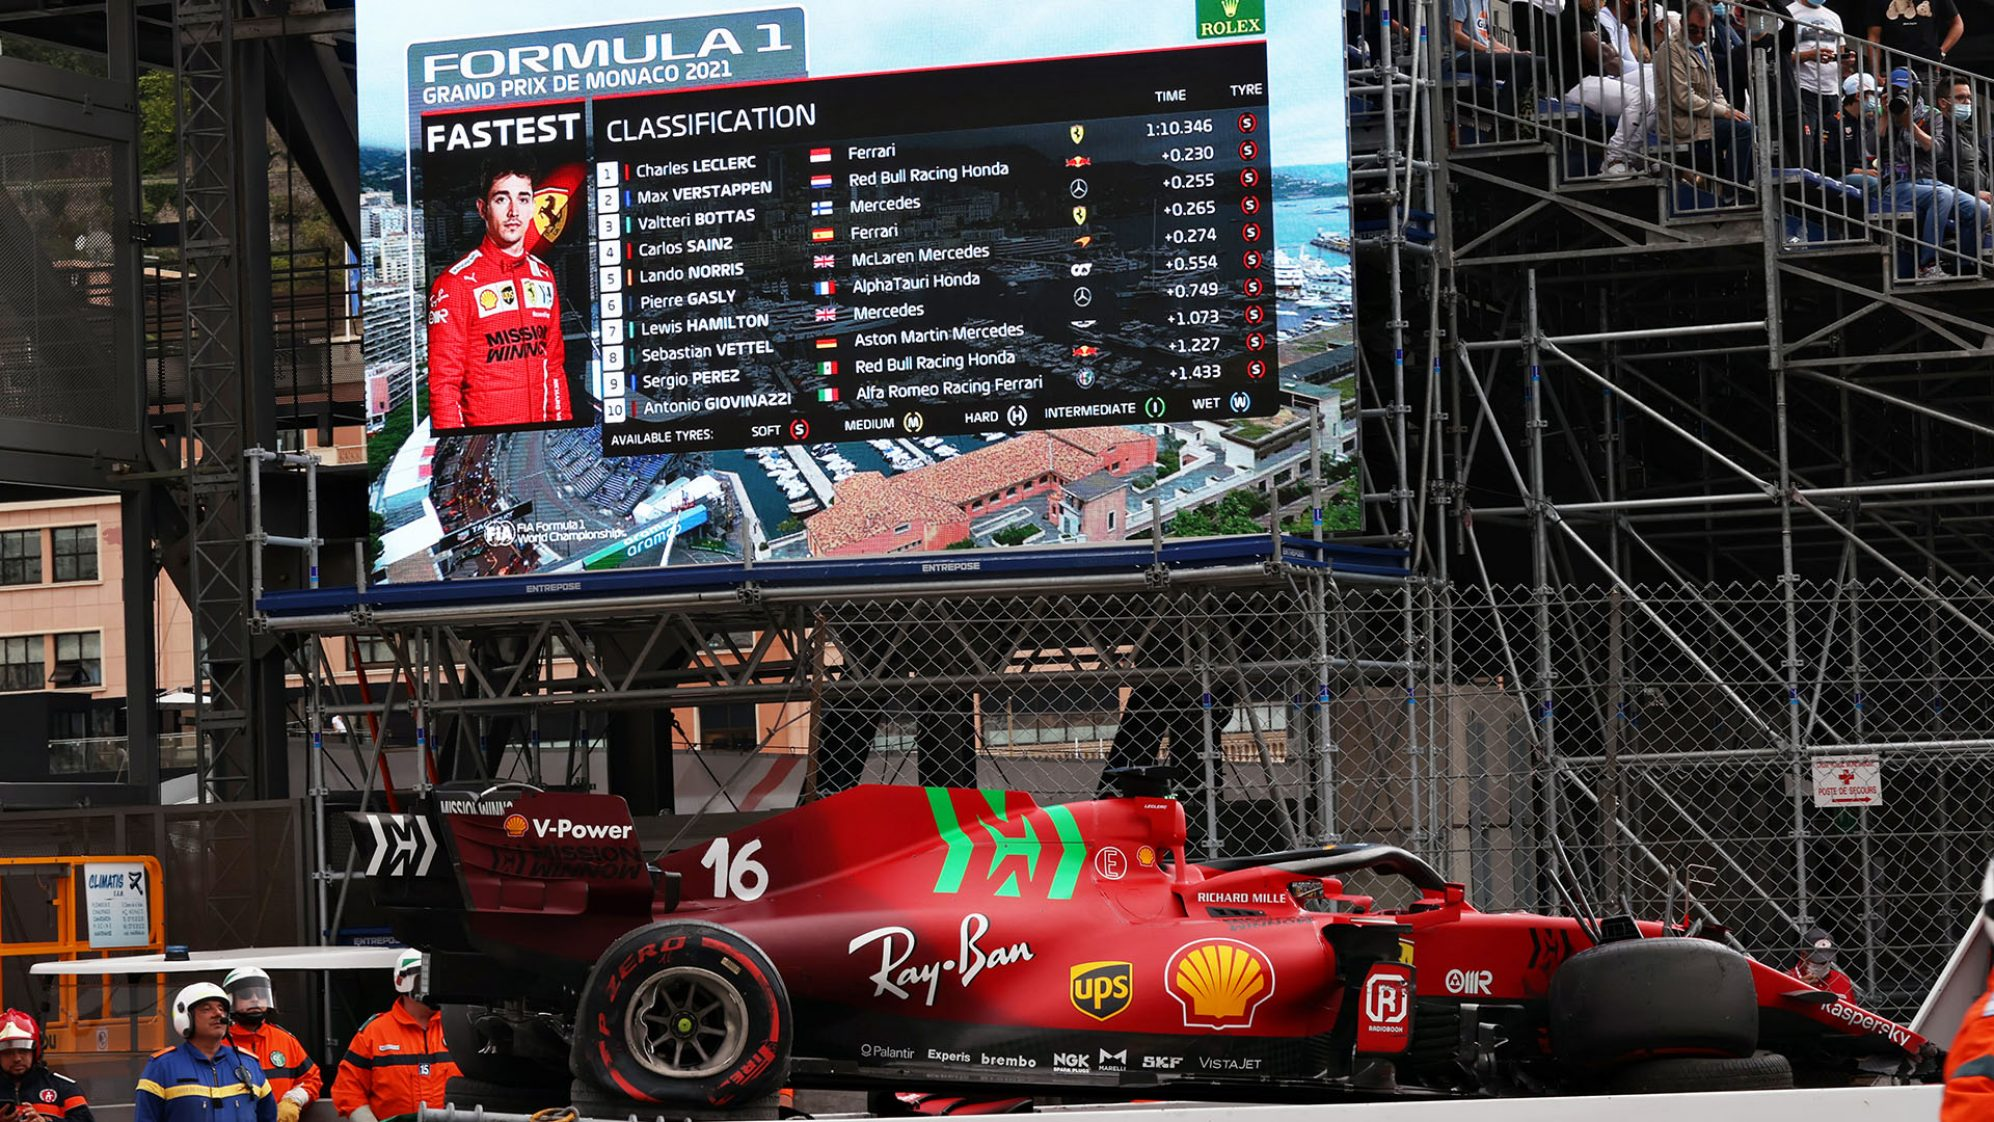 97.-Formula1-Monaco-pole-position-Leclerc.jpg